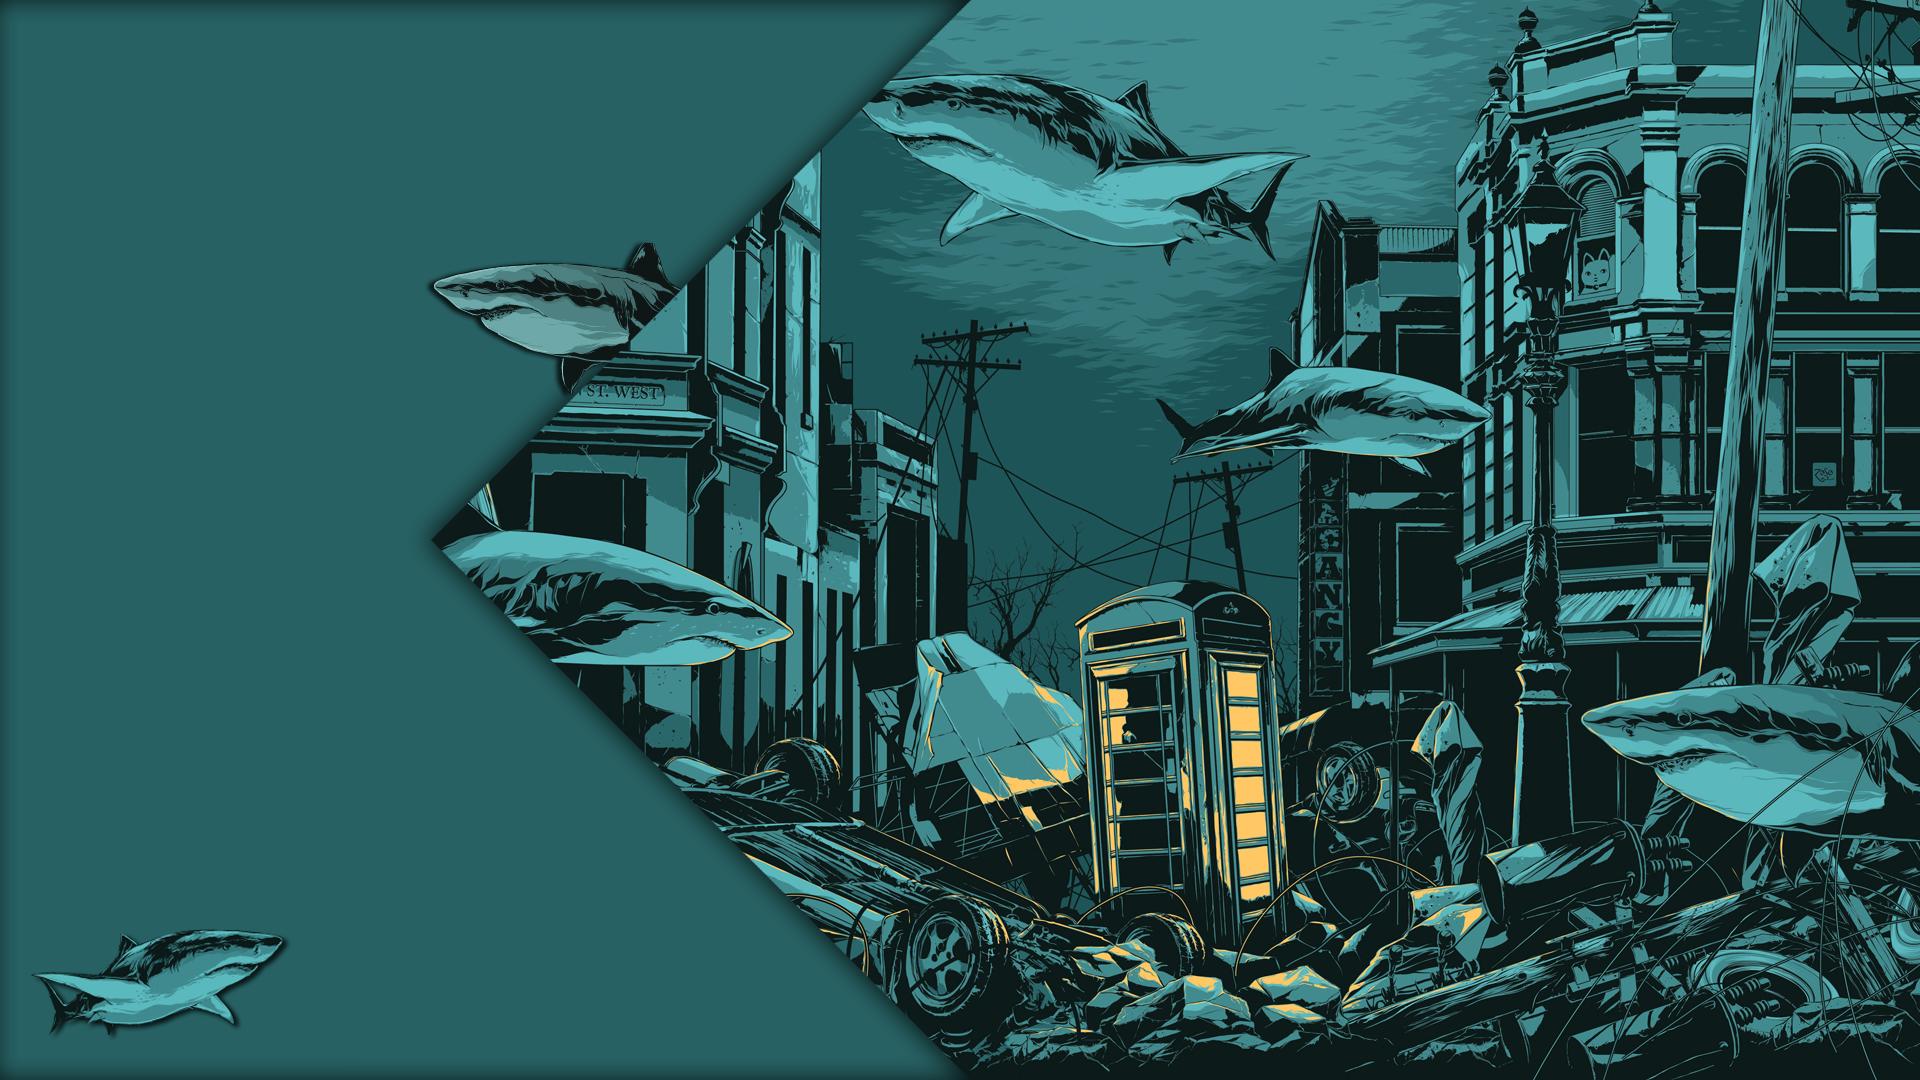 Billy Talent Dead Silence Wallpaper By Blooddrunkdesigns On